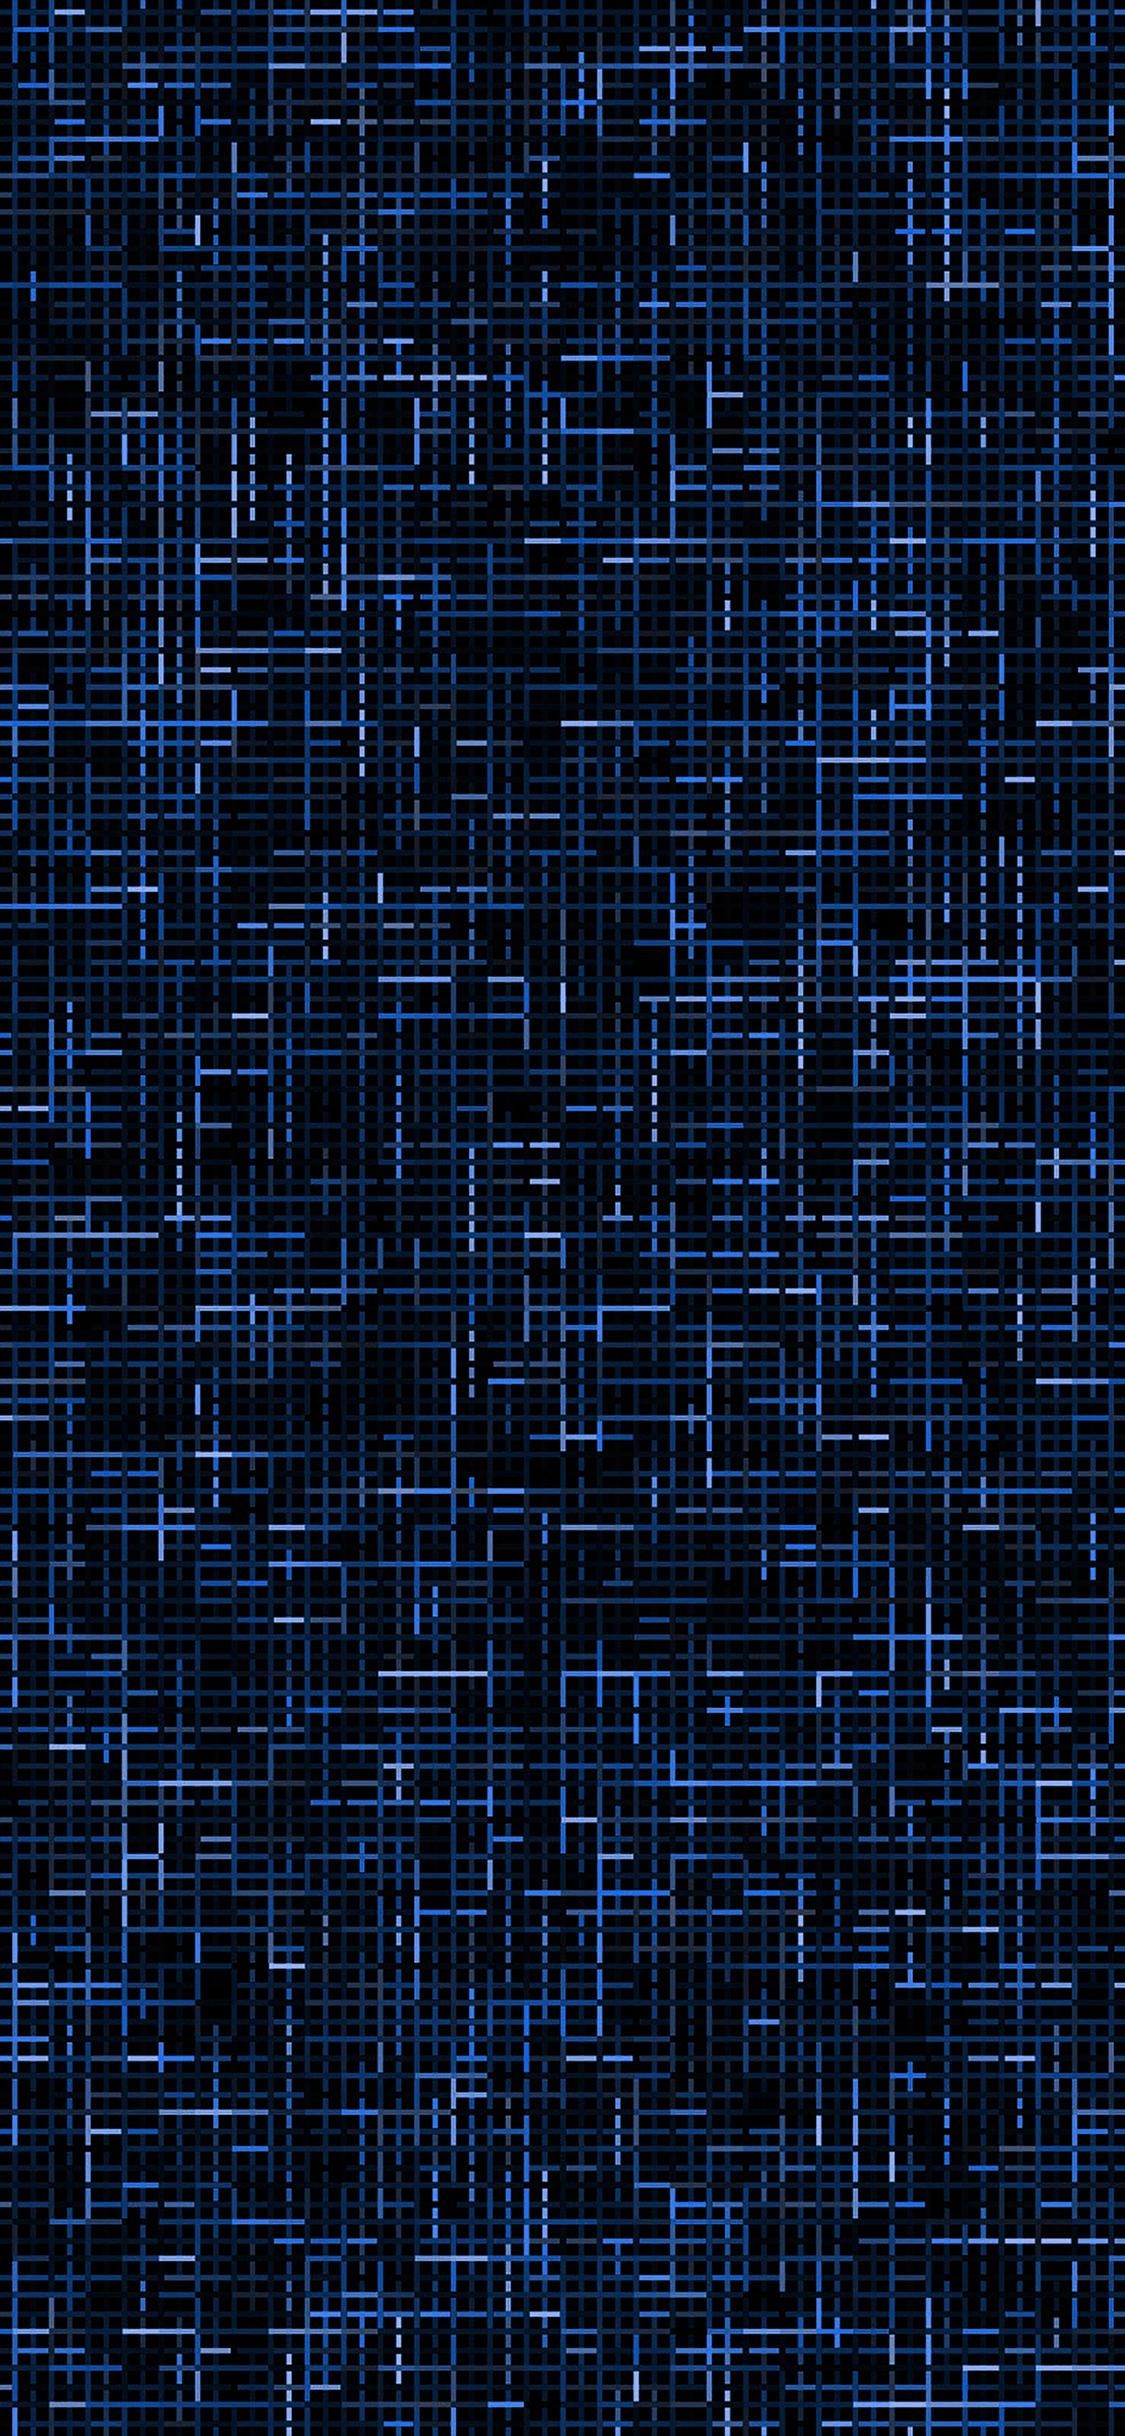 iPhoneXpapers.com-Apple-iPhone-wallpaper-vb03-wallpaper-criss-cross-simon-cpage-blue-pattern